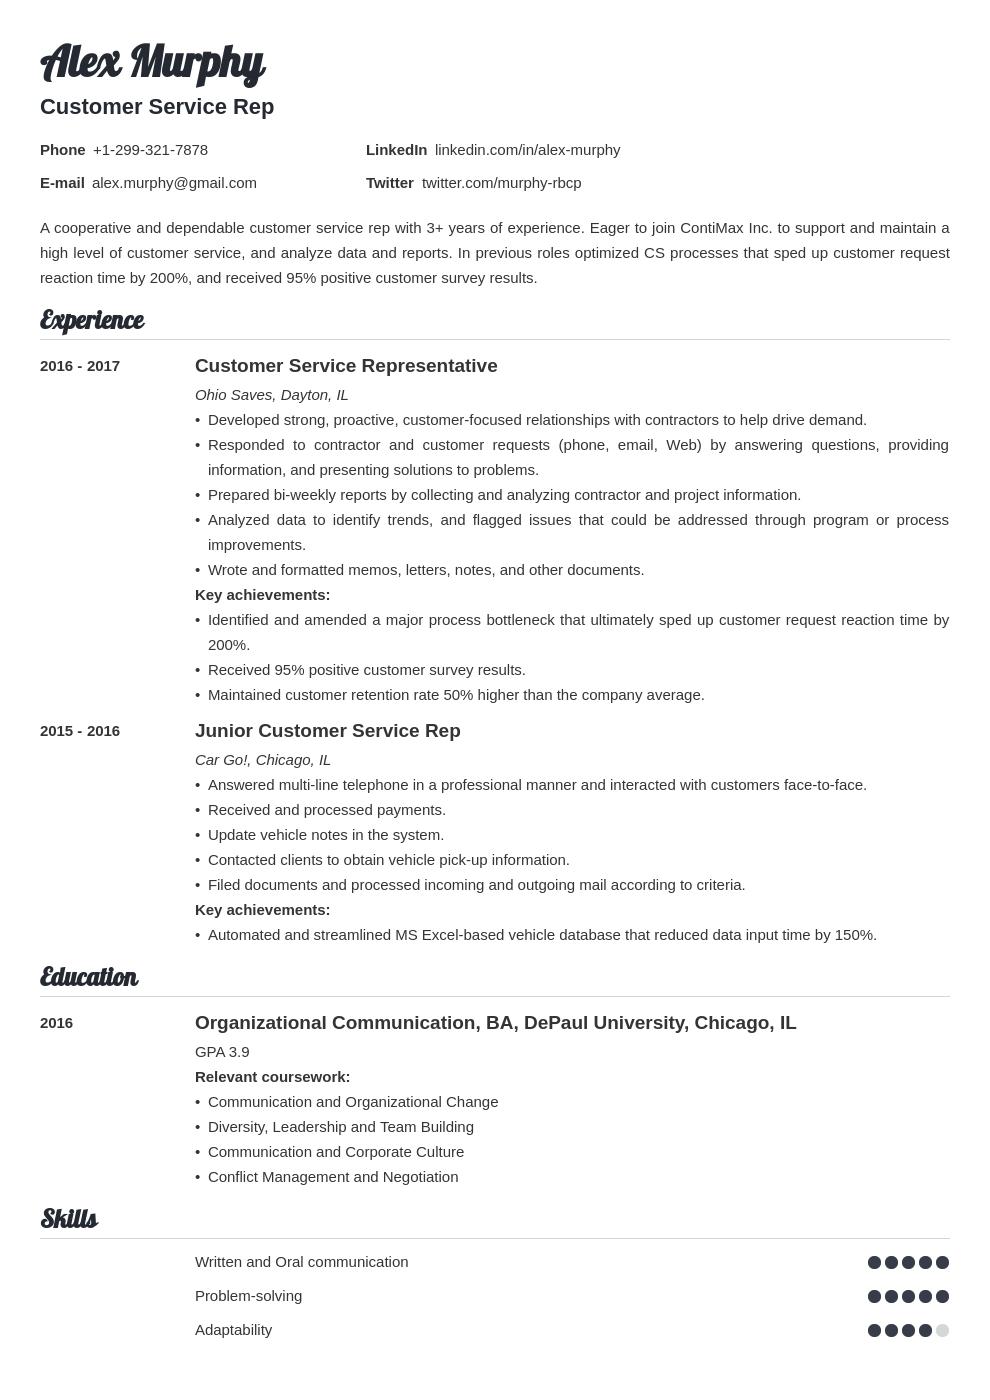 resume relevant coursework resume template valera